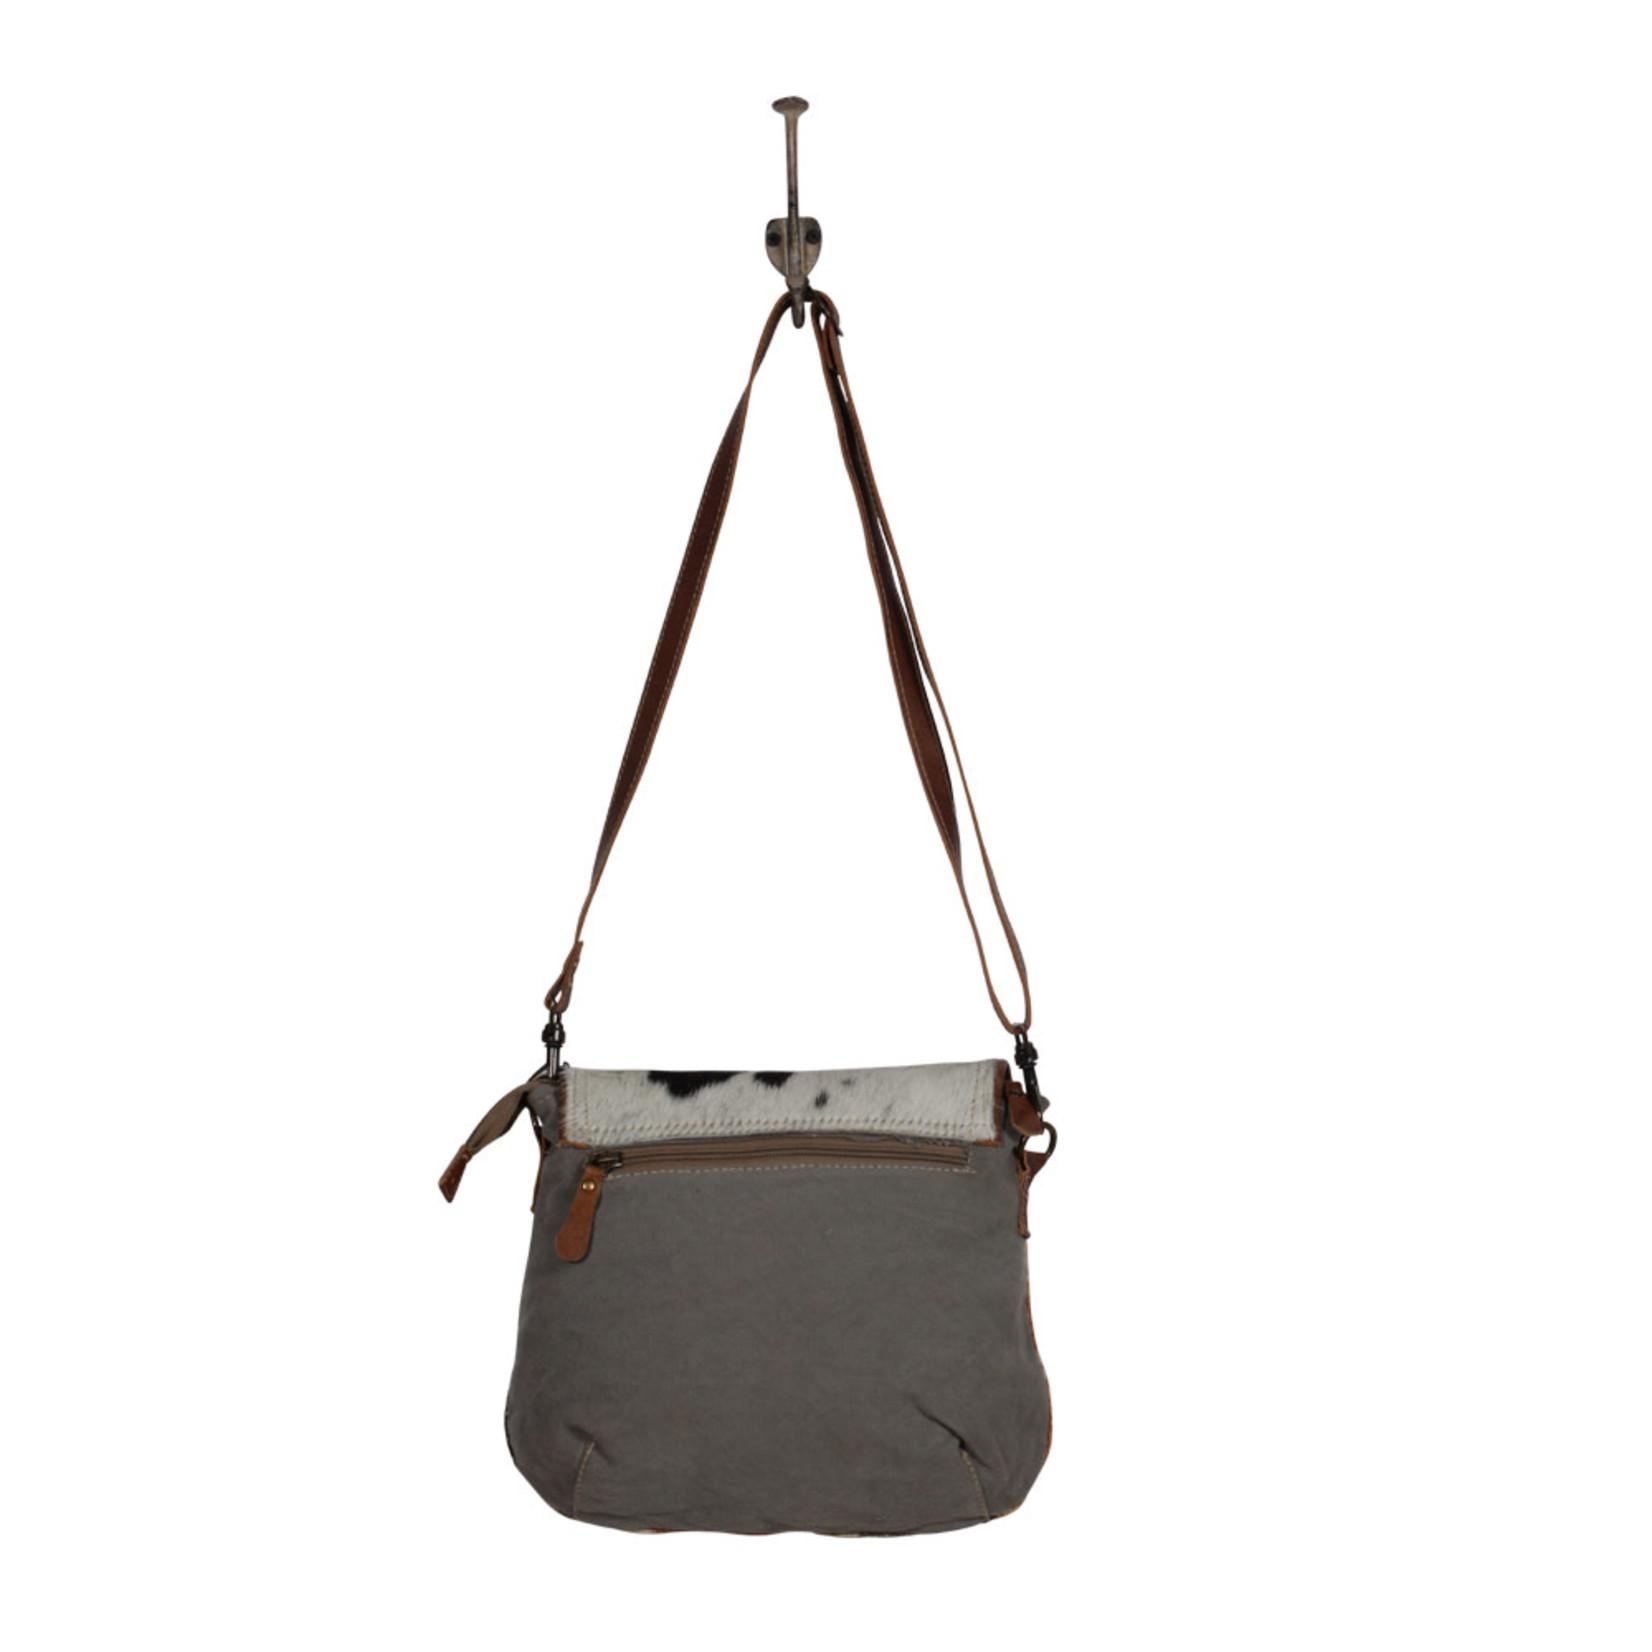 Myra Bags S-2049 Outlandish Small & Crossbody Bag